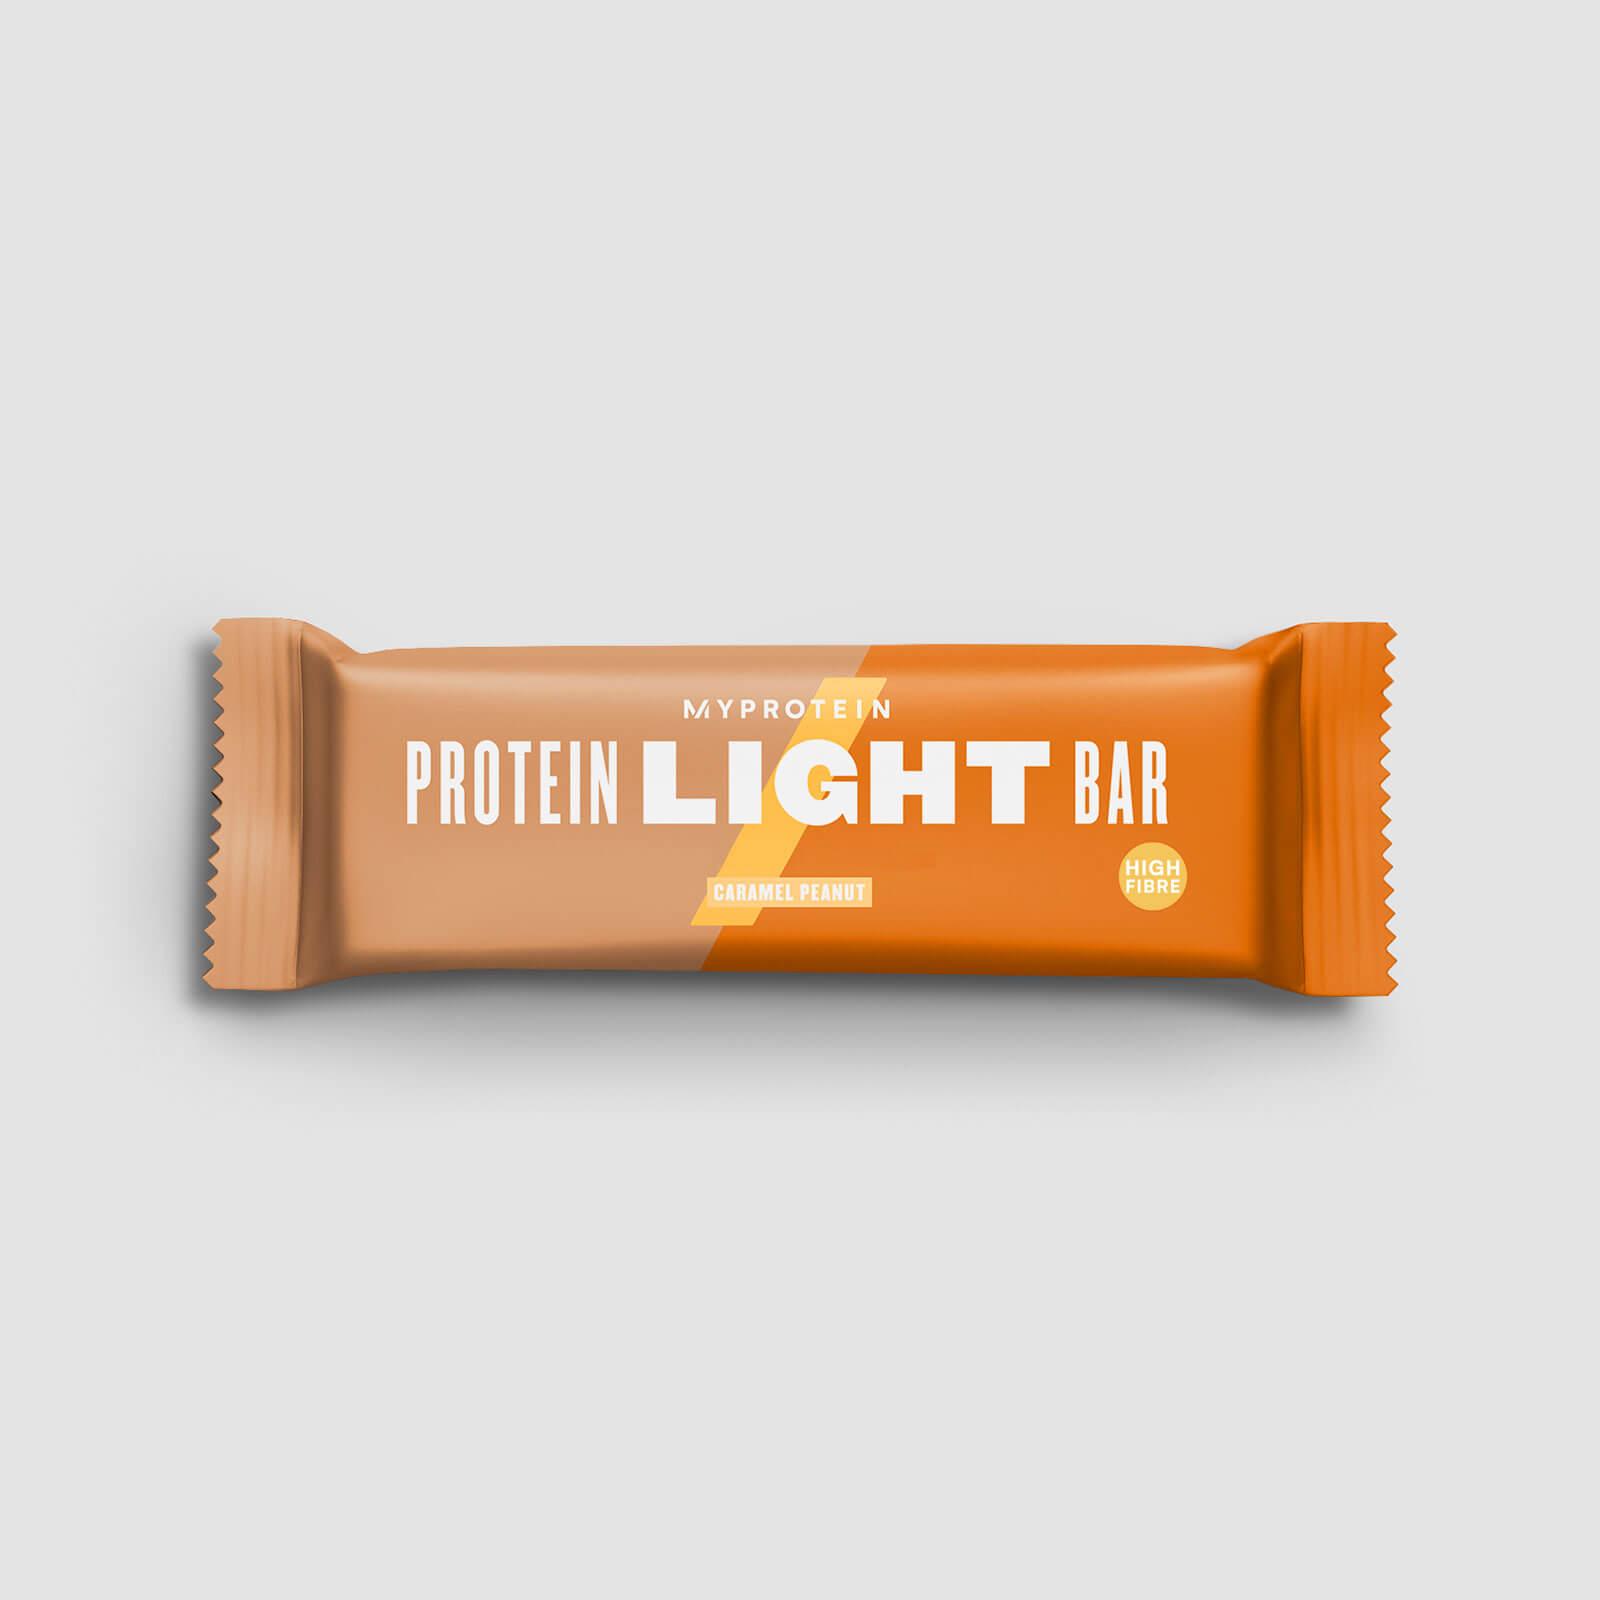 Protein Light Bar (Sample) - 65g - Speculoos